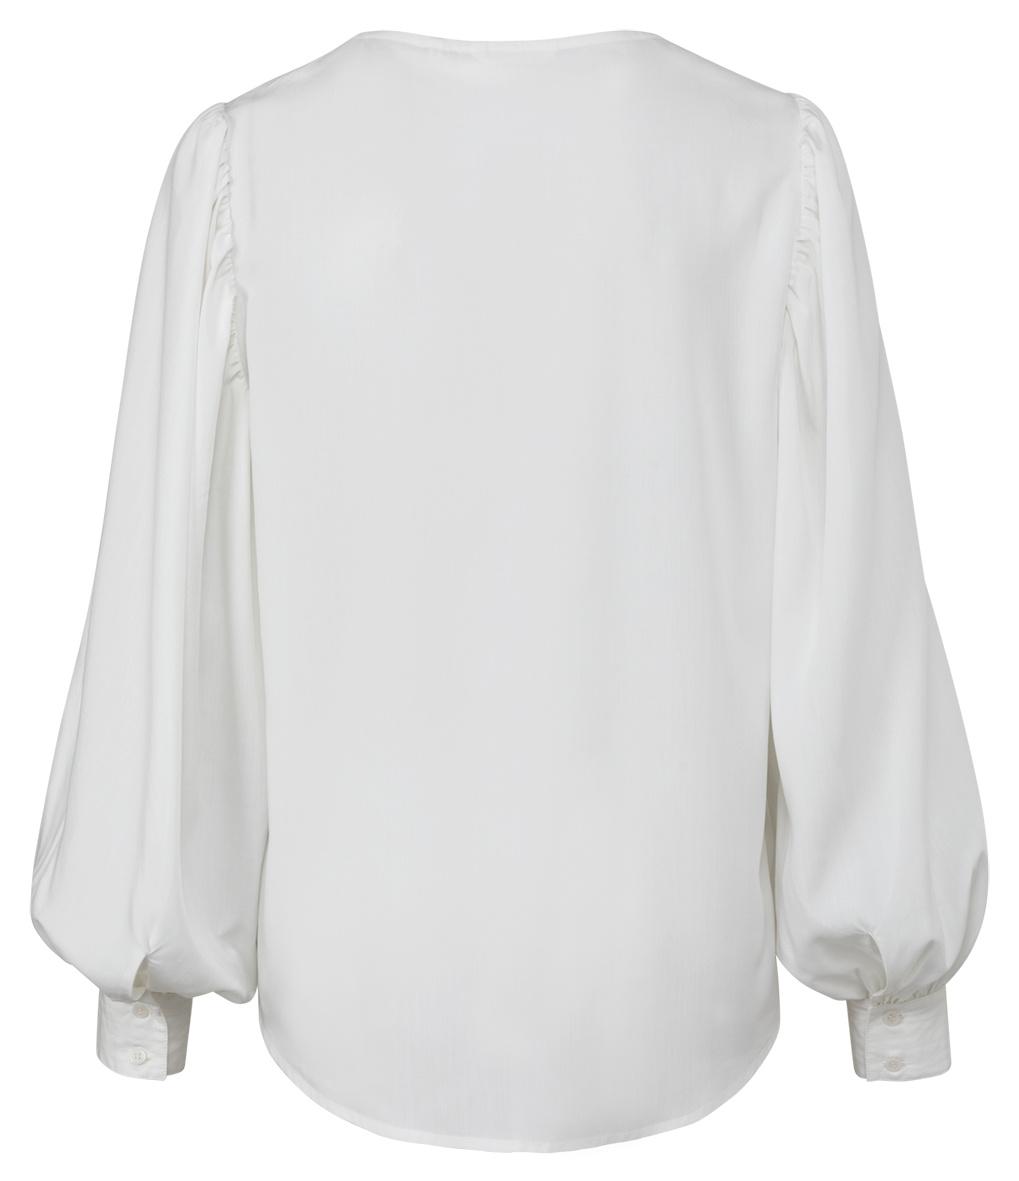 yaya Drapy top with volum 1901481-123-2